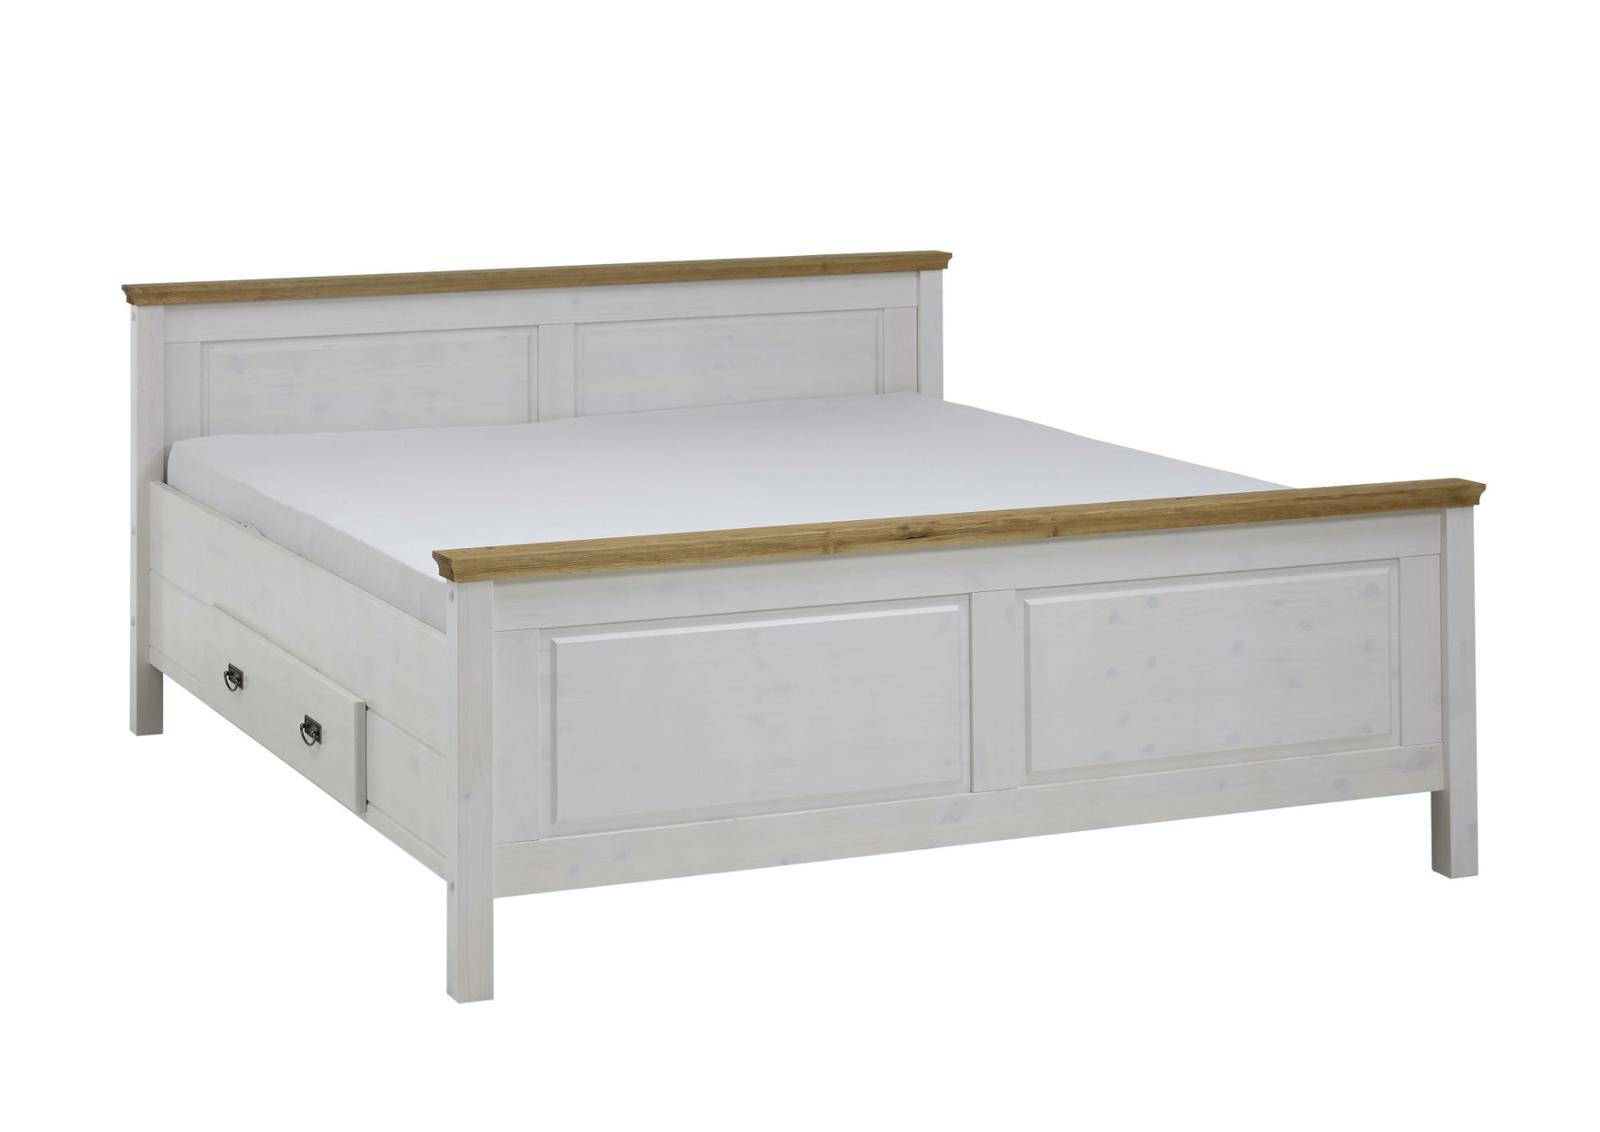 Massivholz Schlafzimmer Bett Landhausstil Harri weiß gelaugt geölt